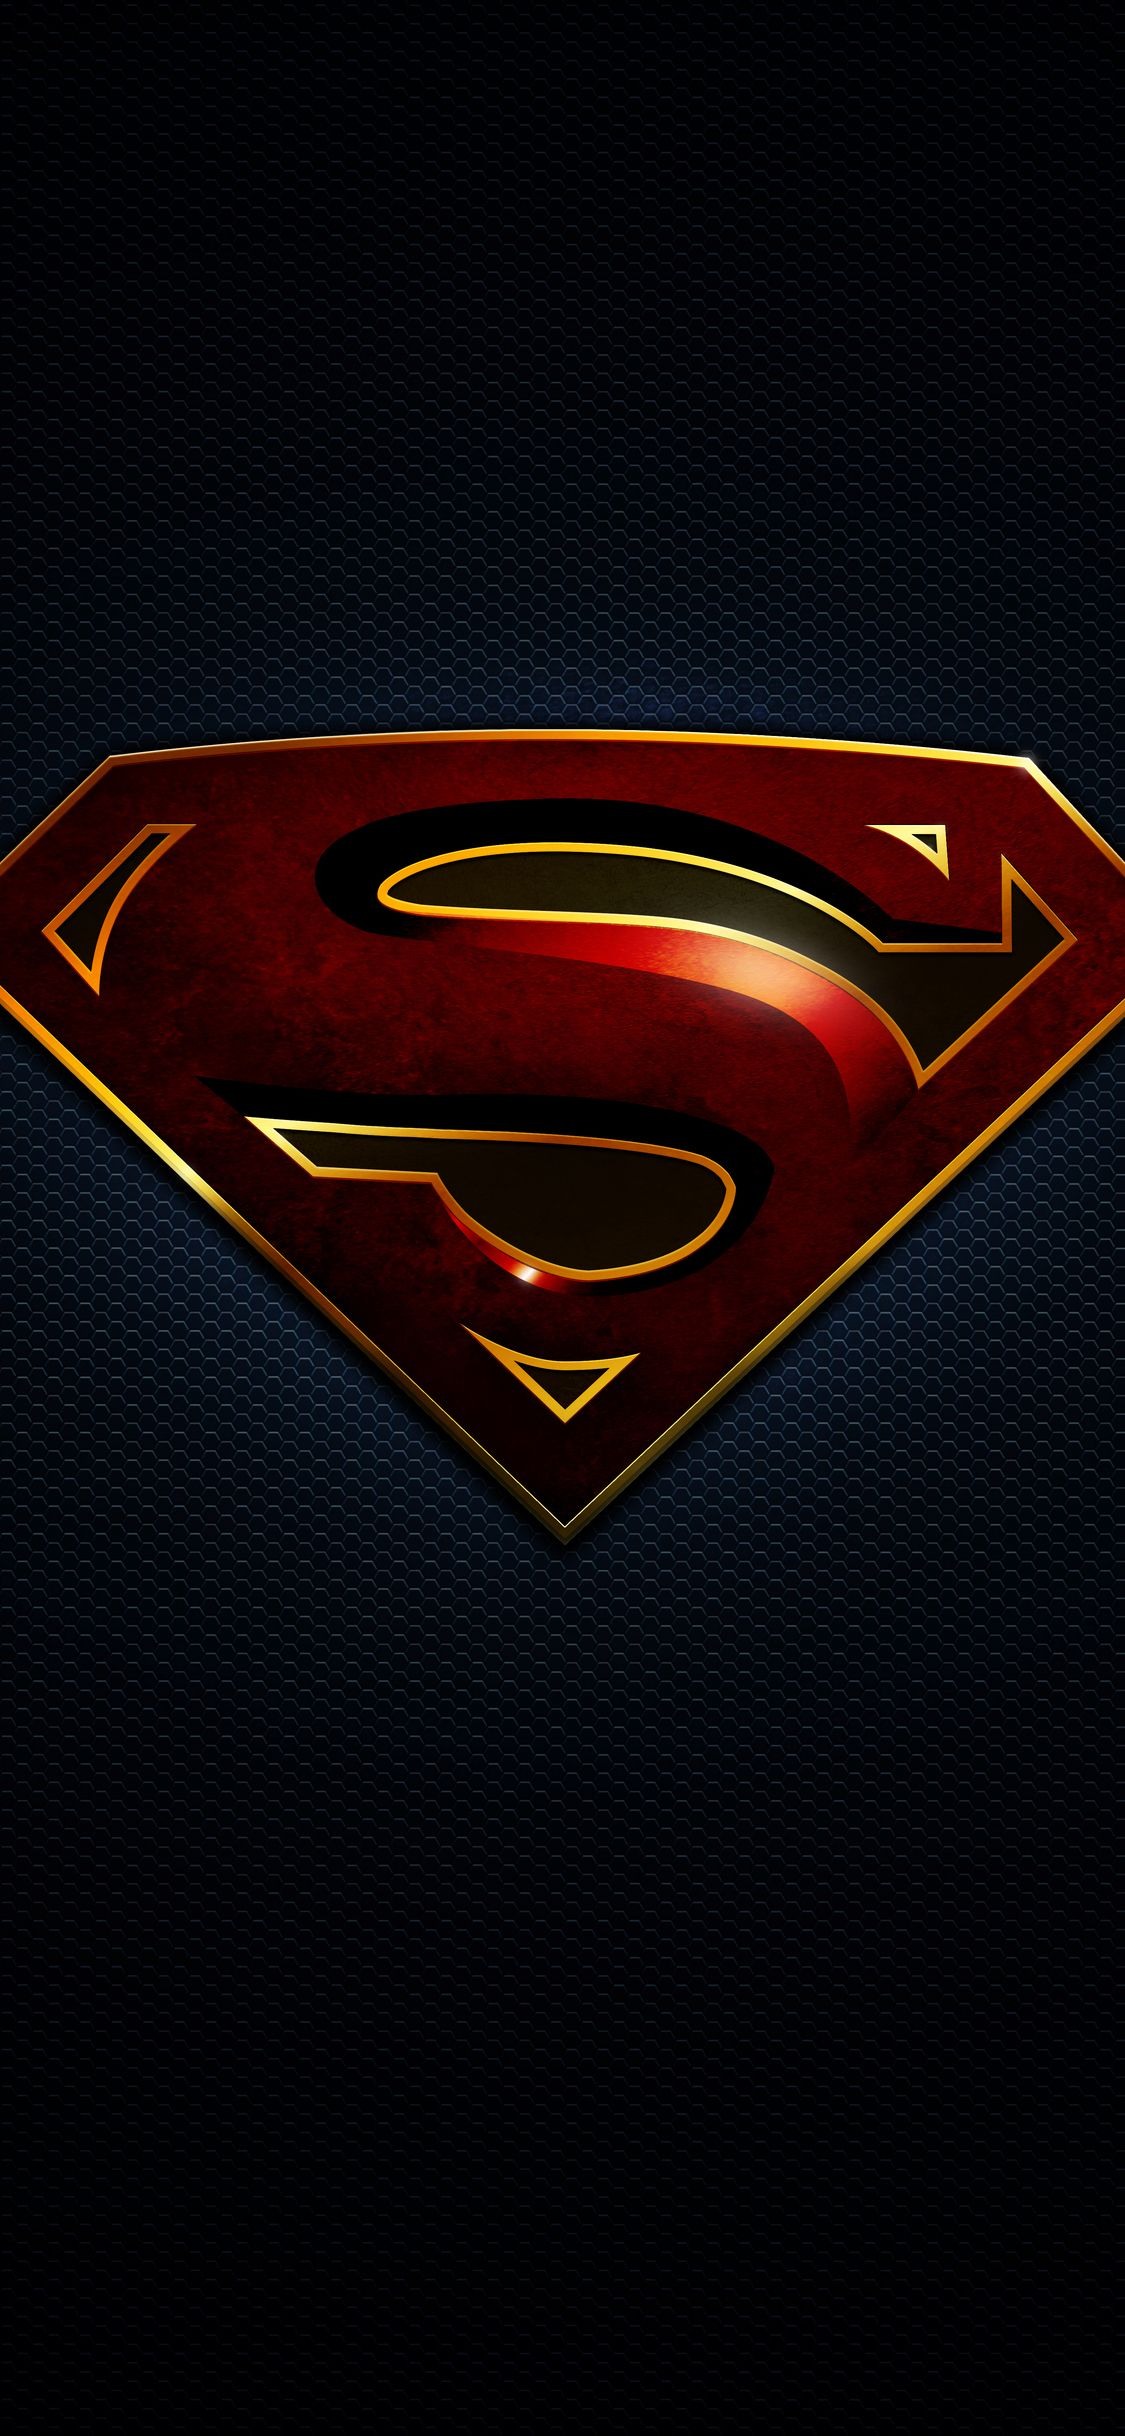 Pin By Richard Calderon On Kripton In 2020 Superman Wallpaper Superman Wallpaper Logo Superman Hd Wallpaper